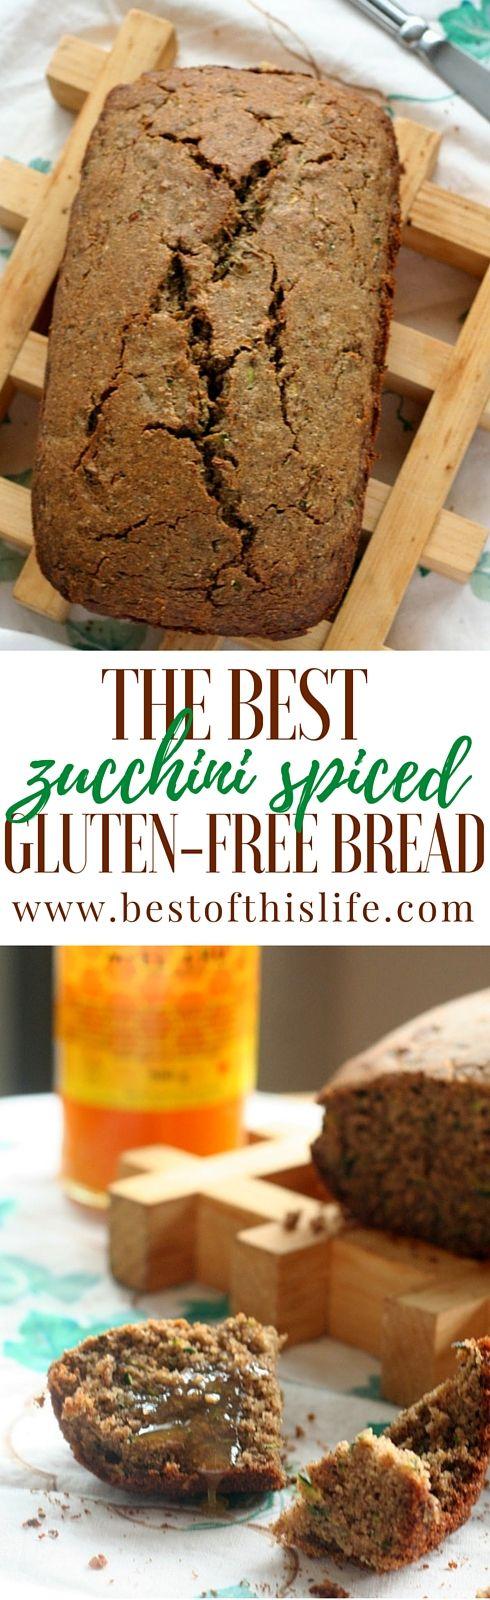 The Best Zucchini Spiced Gluten-Free Bread www.bestofthislife.com